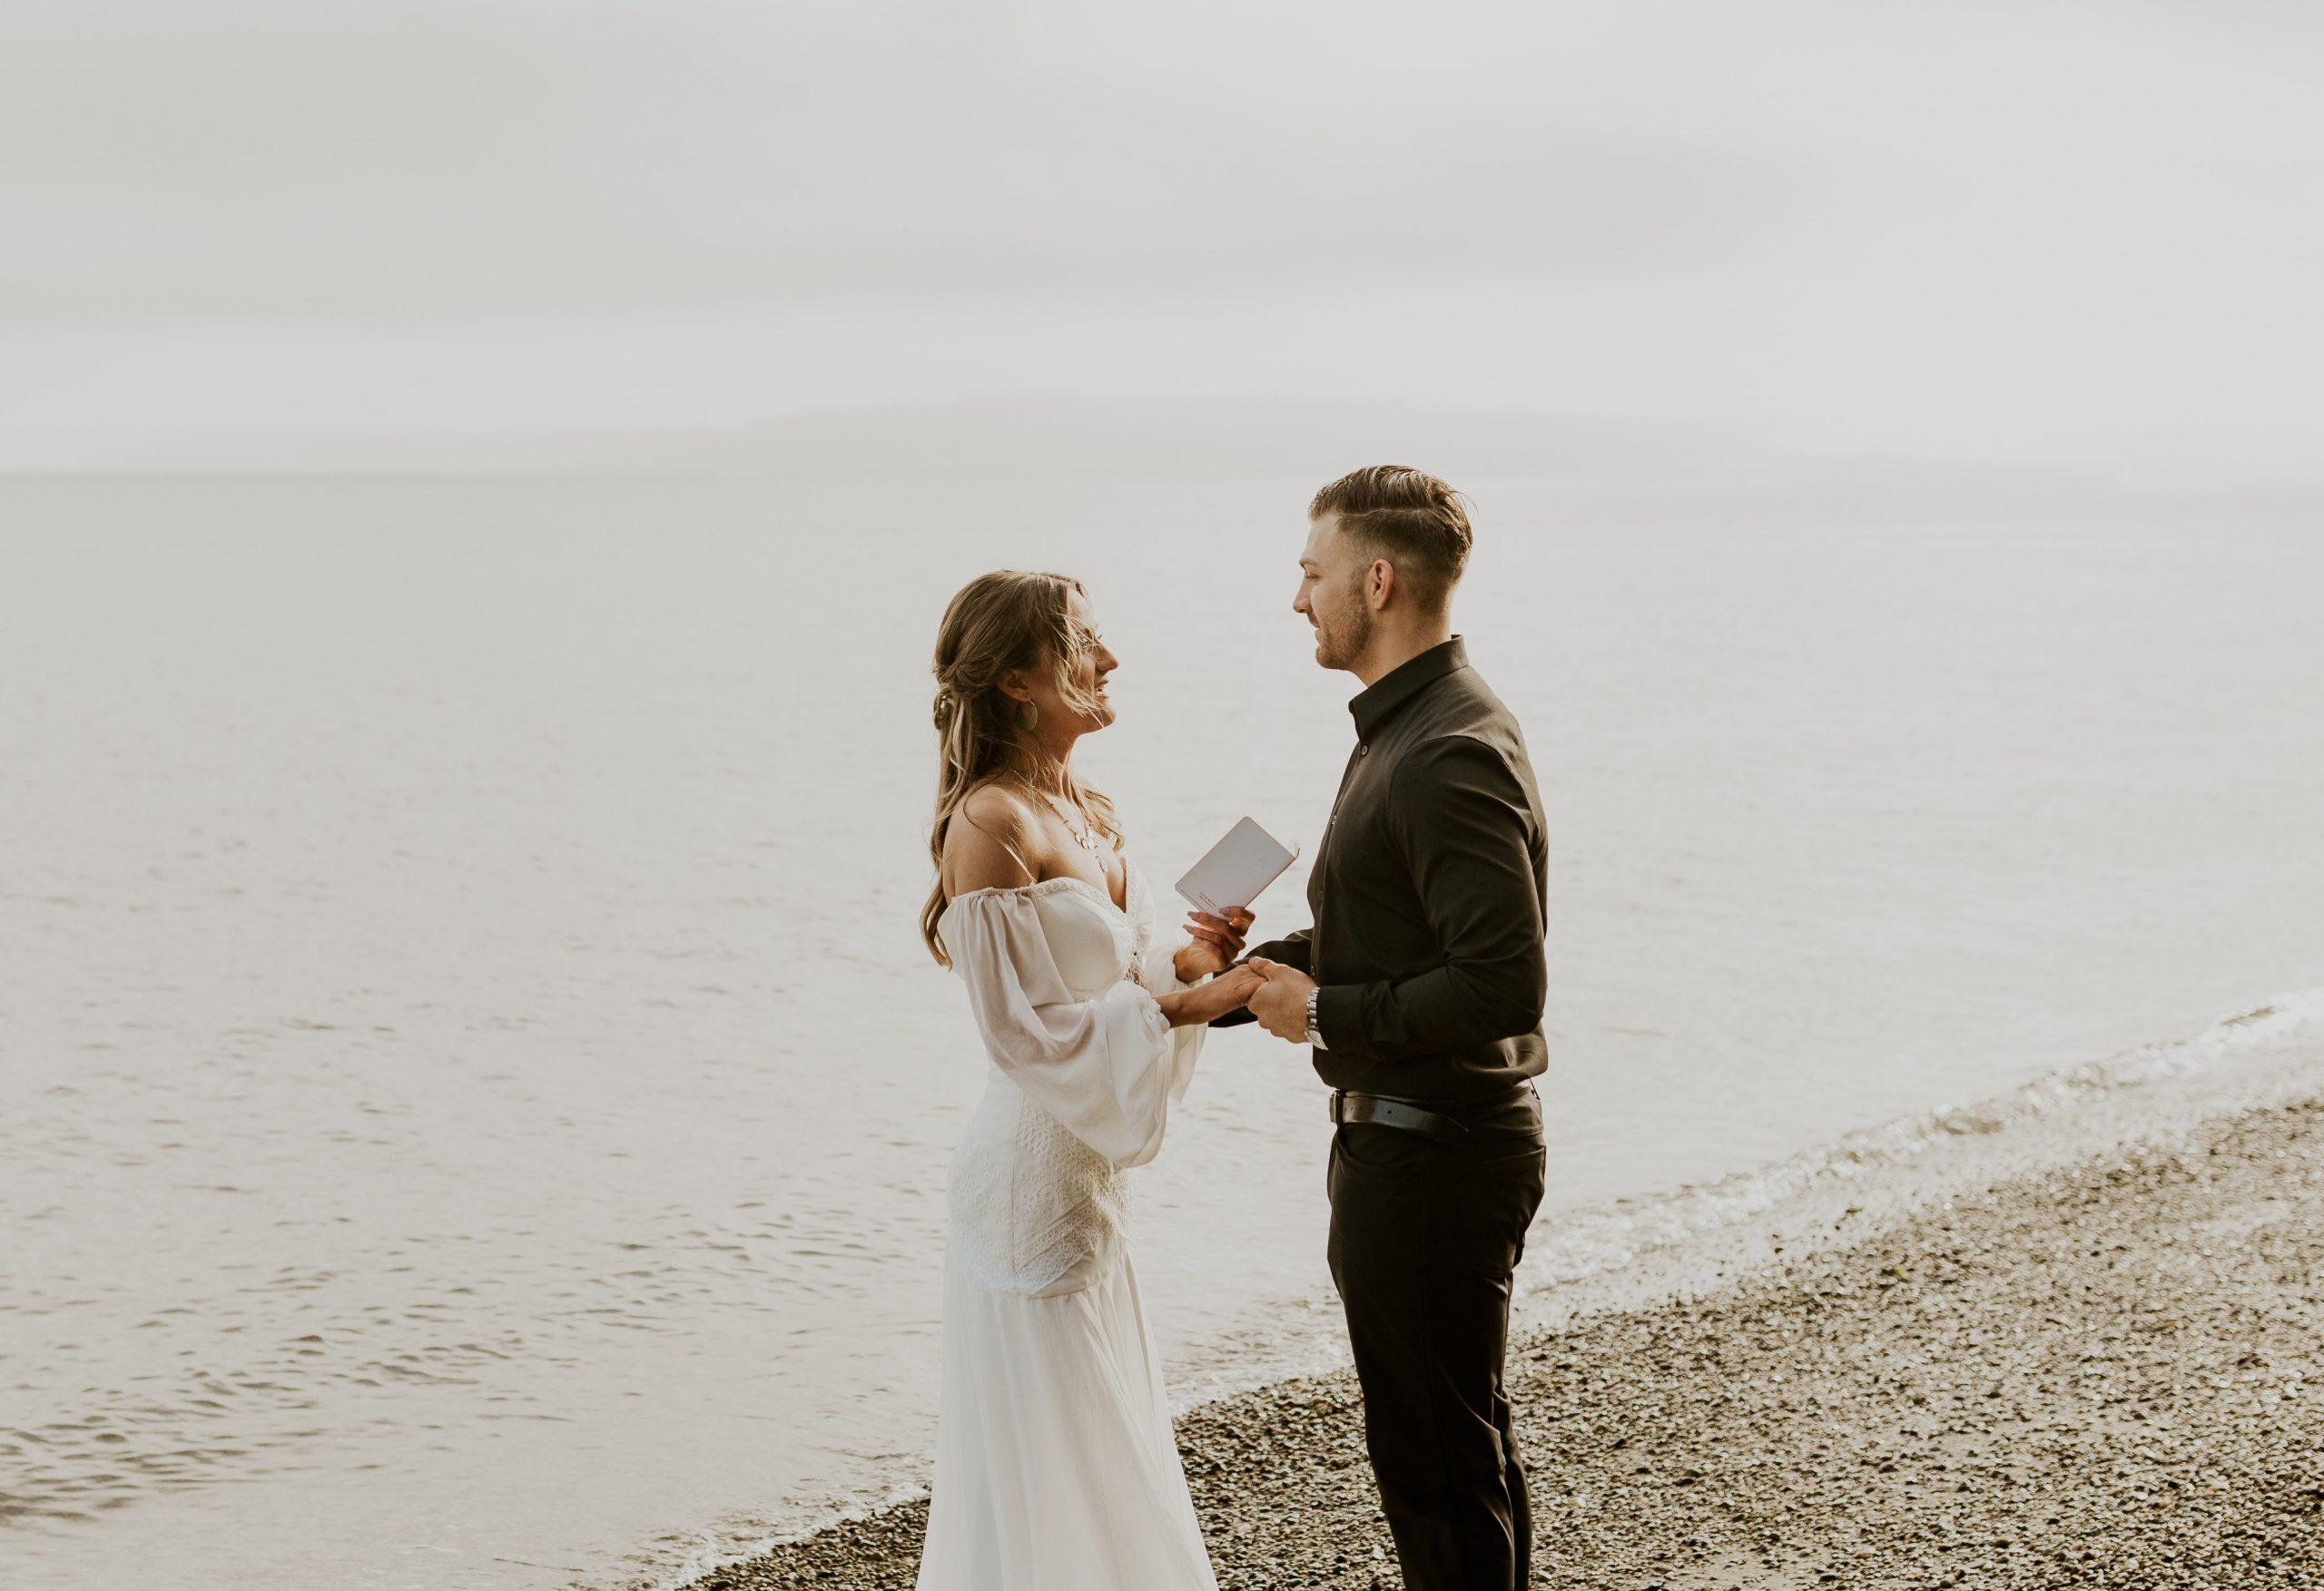 ali-rae-photography-point-defiance-bohemian-sunrise-elopement-washington